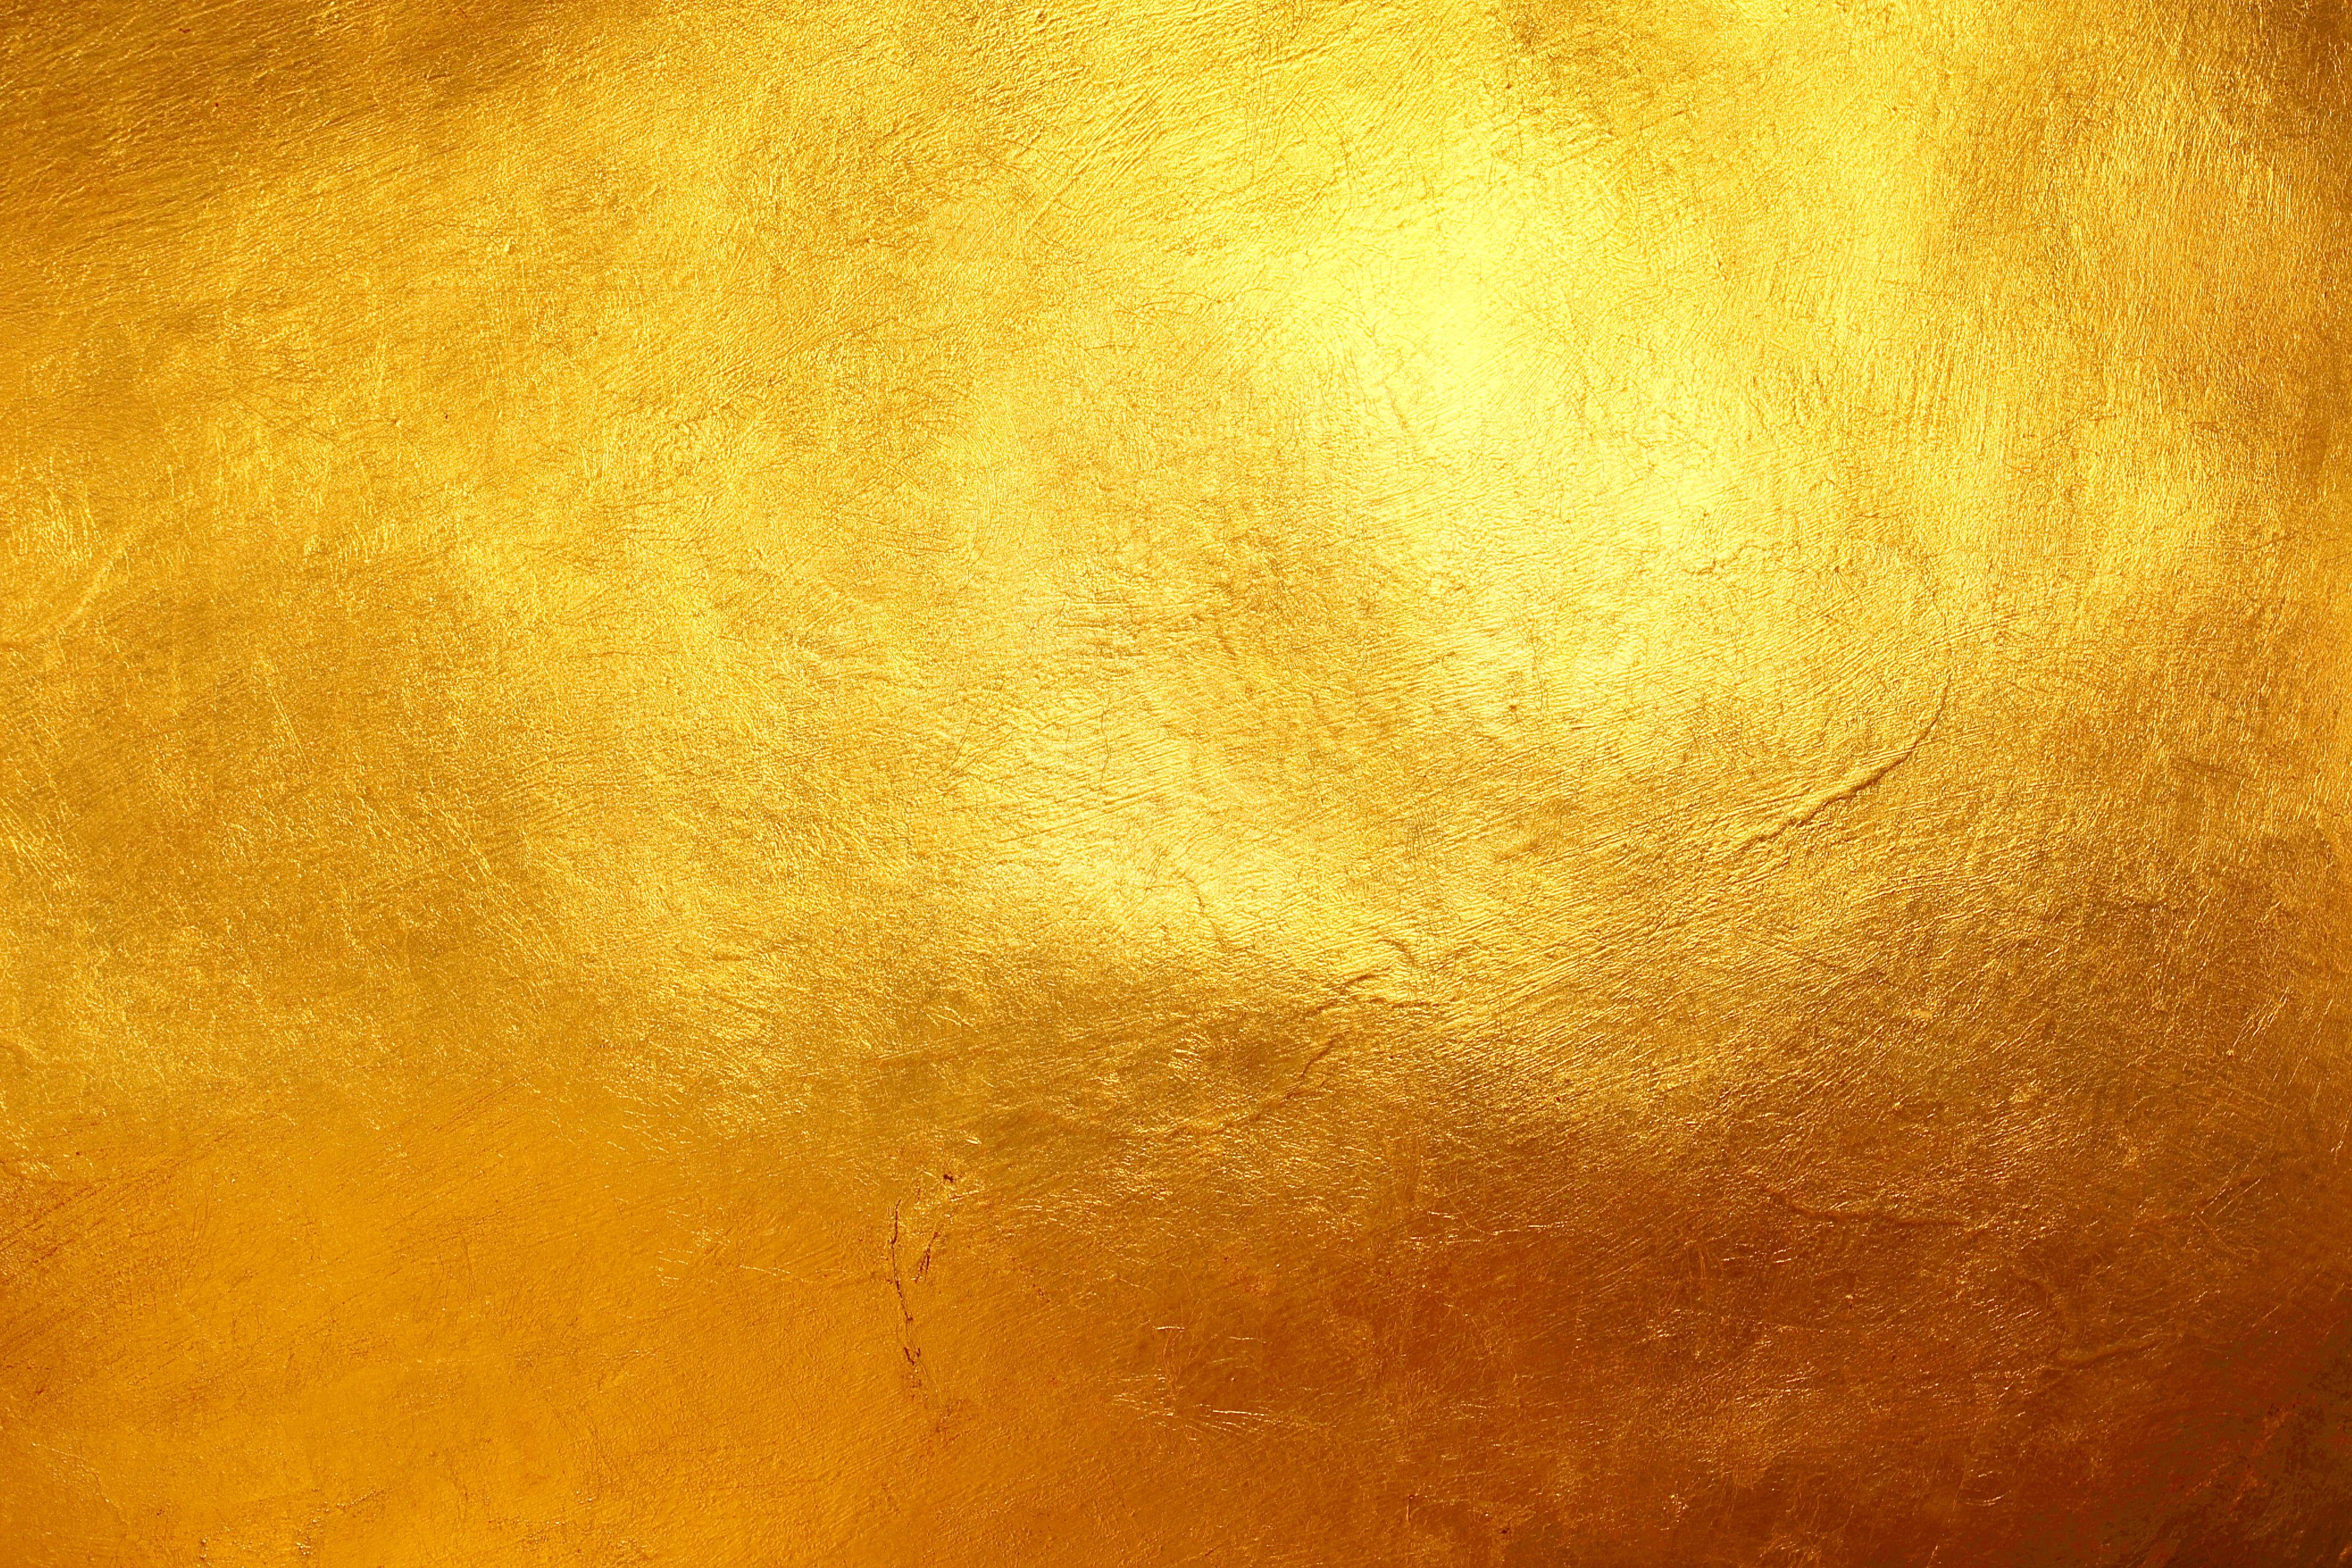 Background Gold Golden Gold Texture 4k Wallpaper Hdwallpaper Desktop Gold Wallpaper Background Gold Texture Background Gold Texture